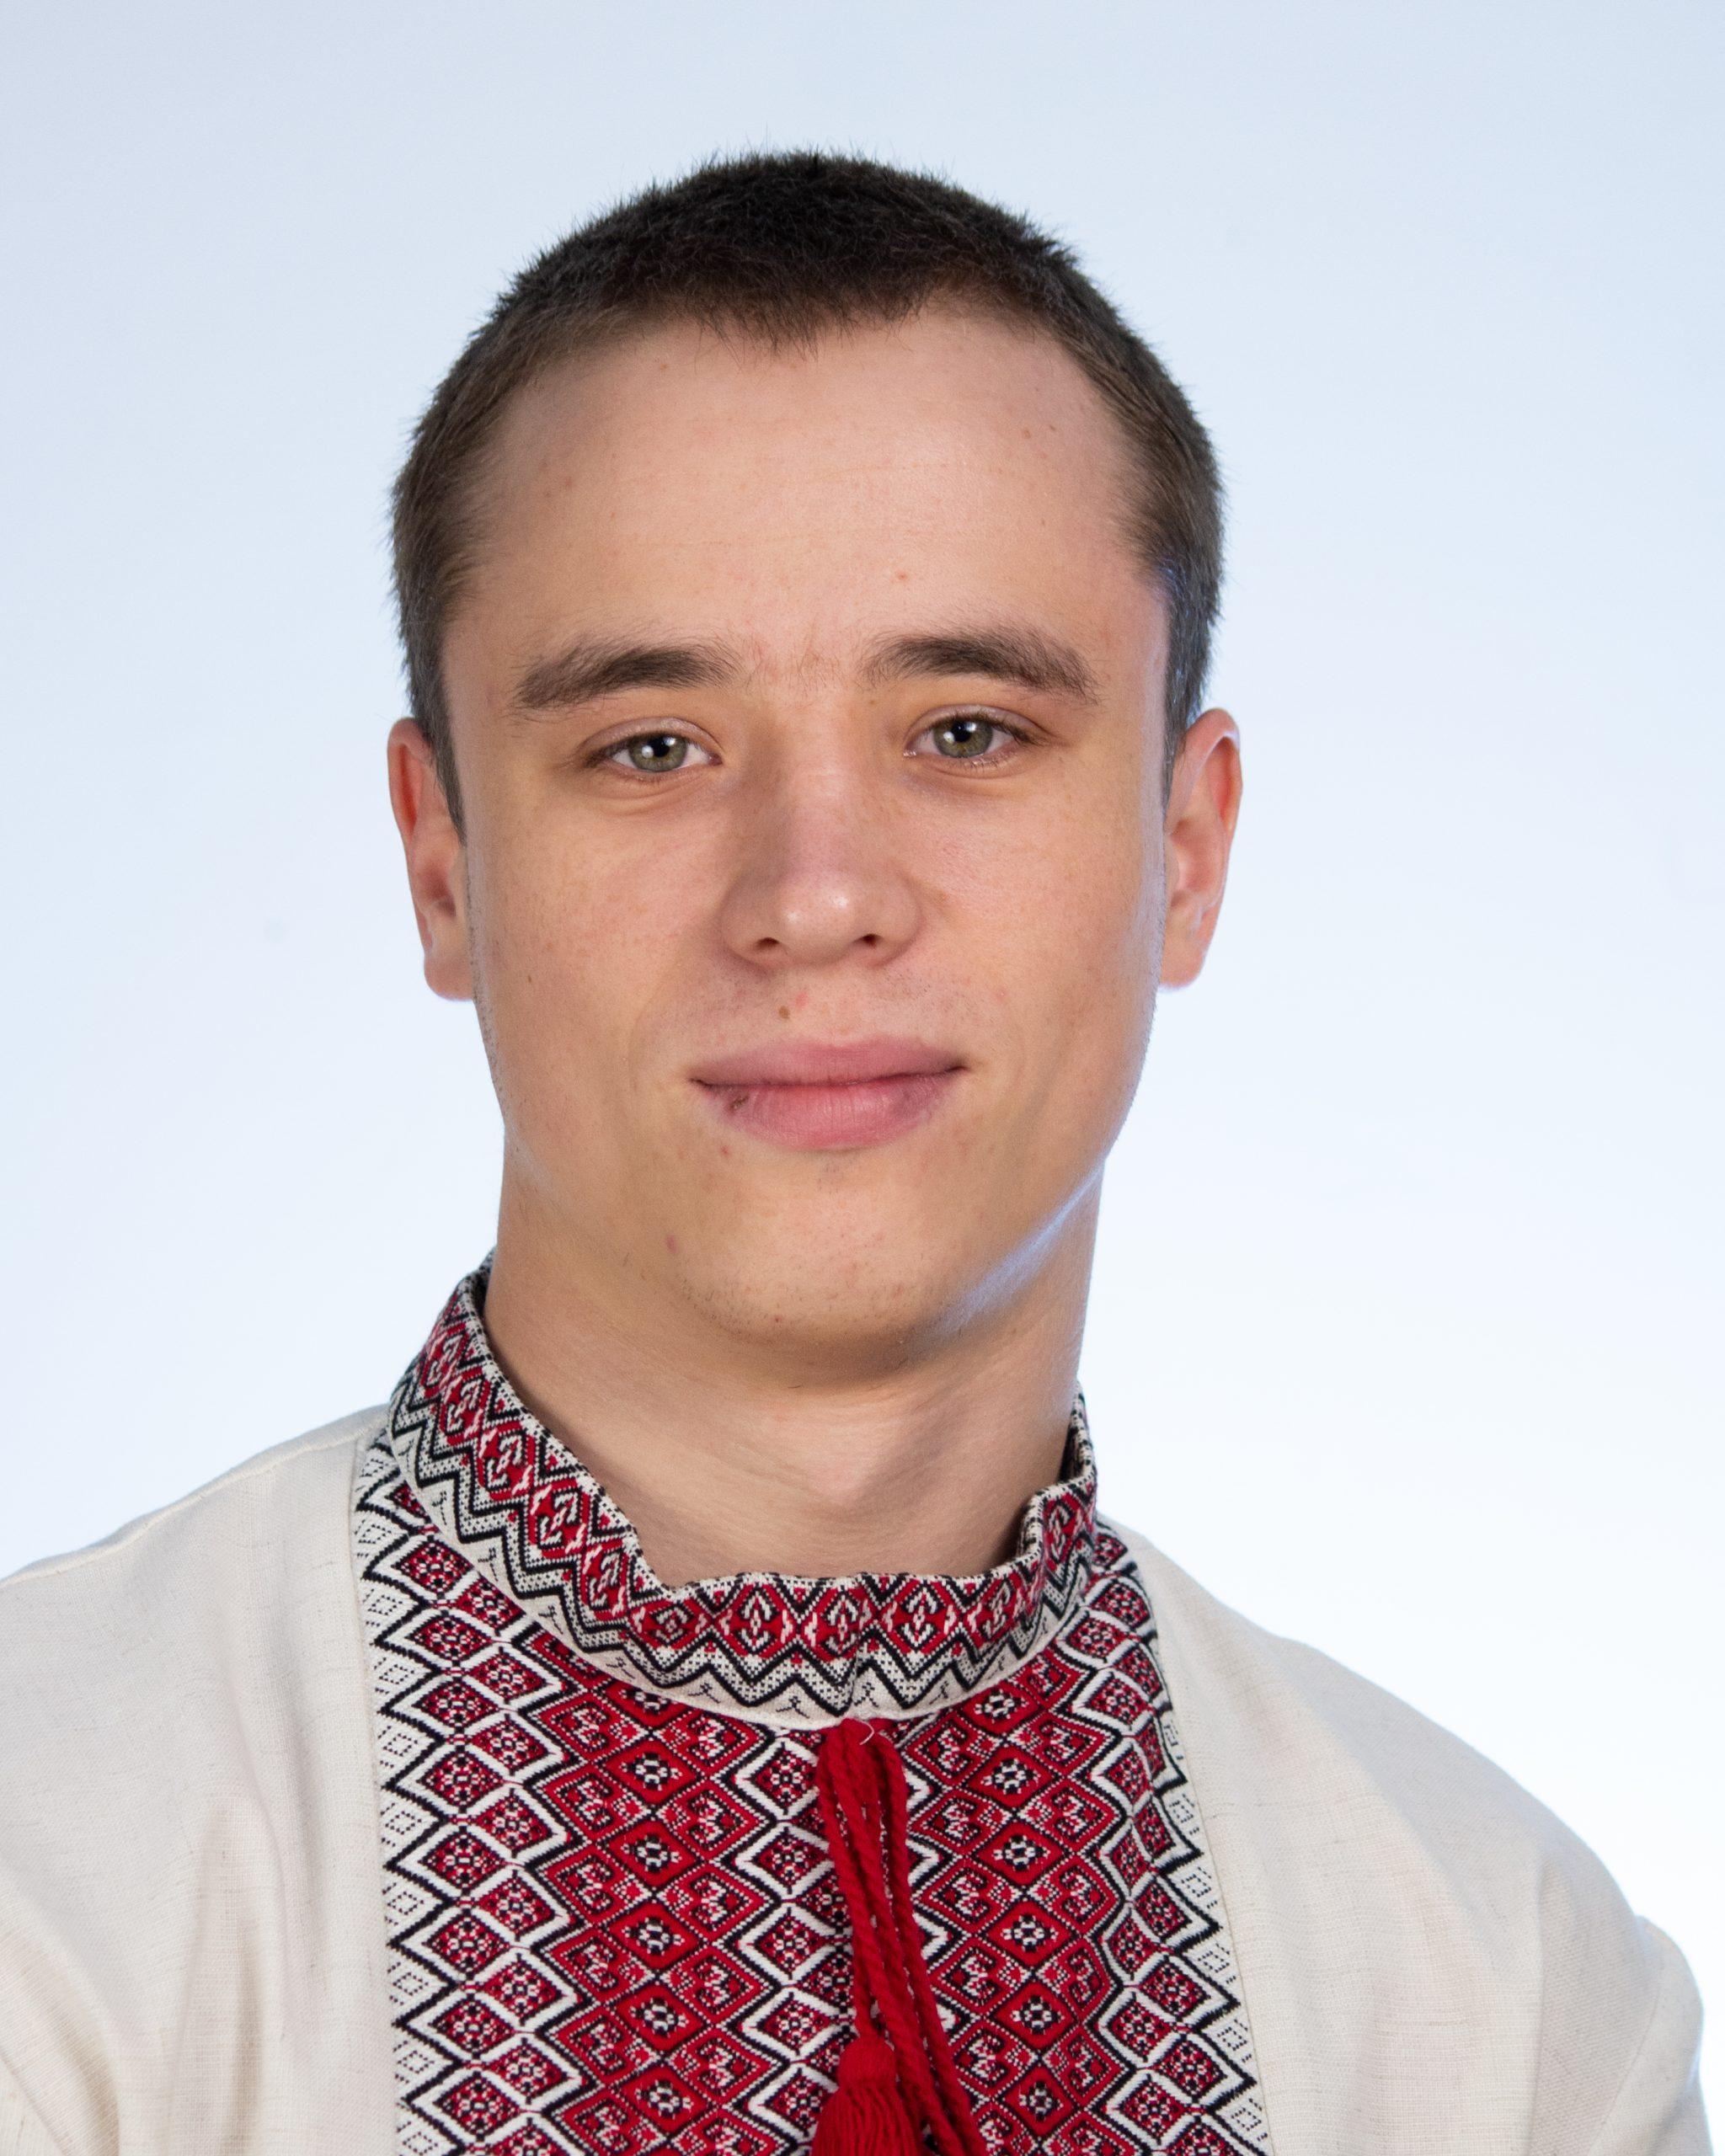 Синчак Богдан Анатолійович